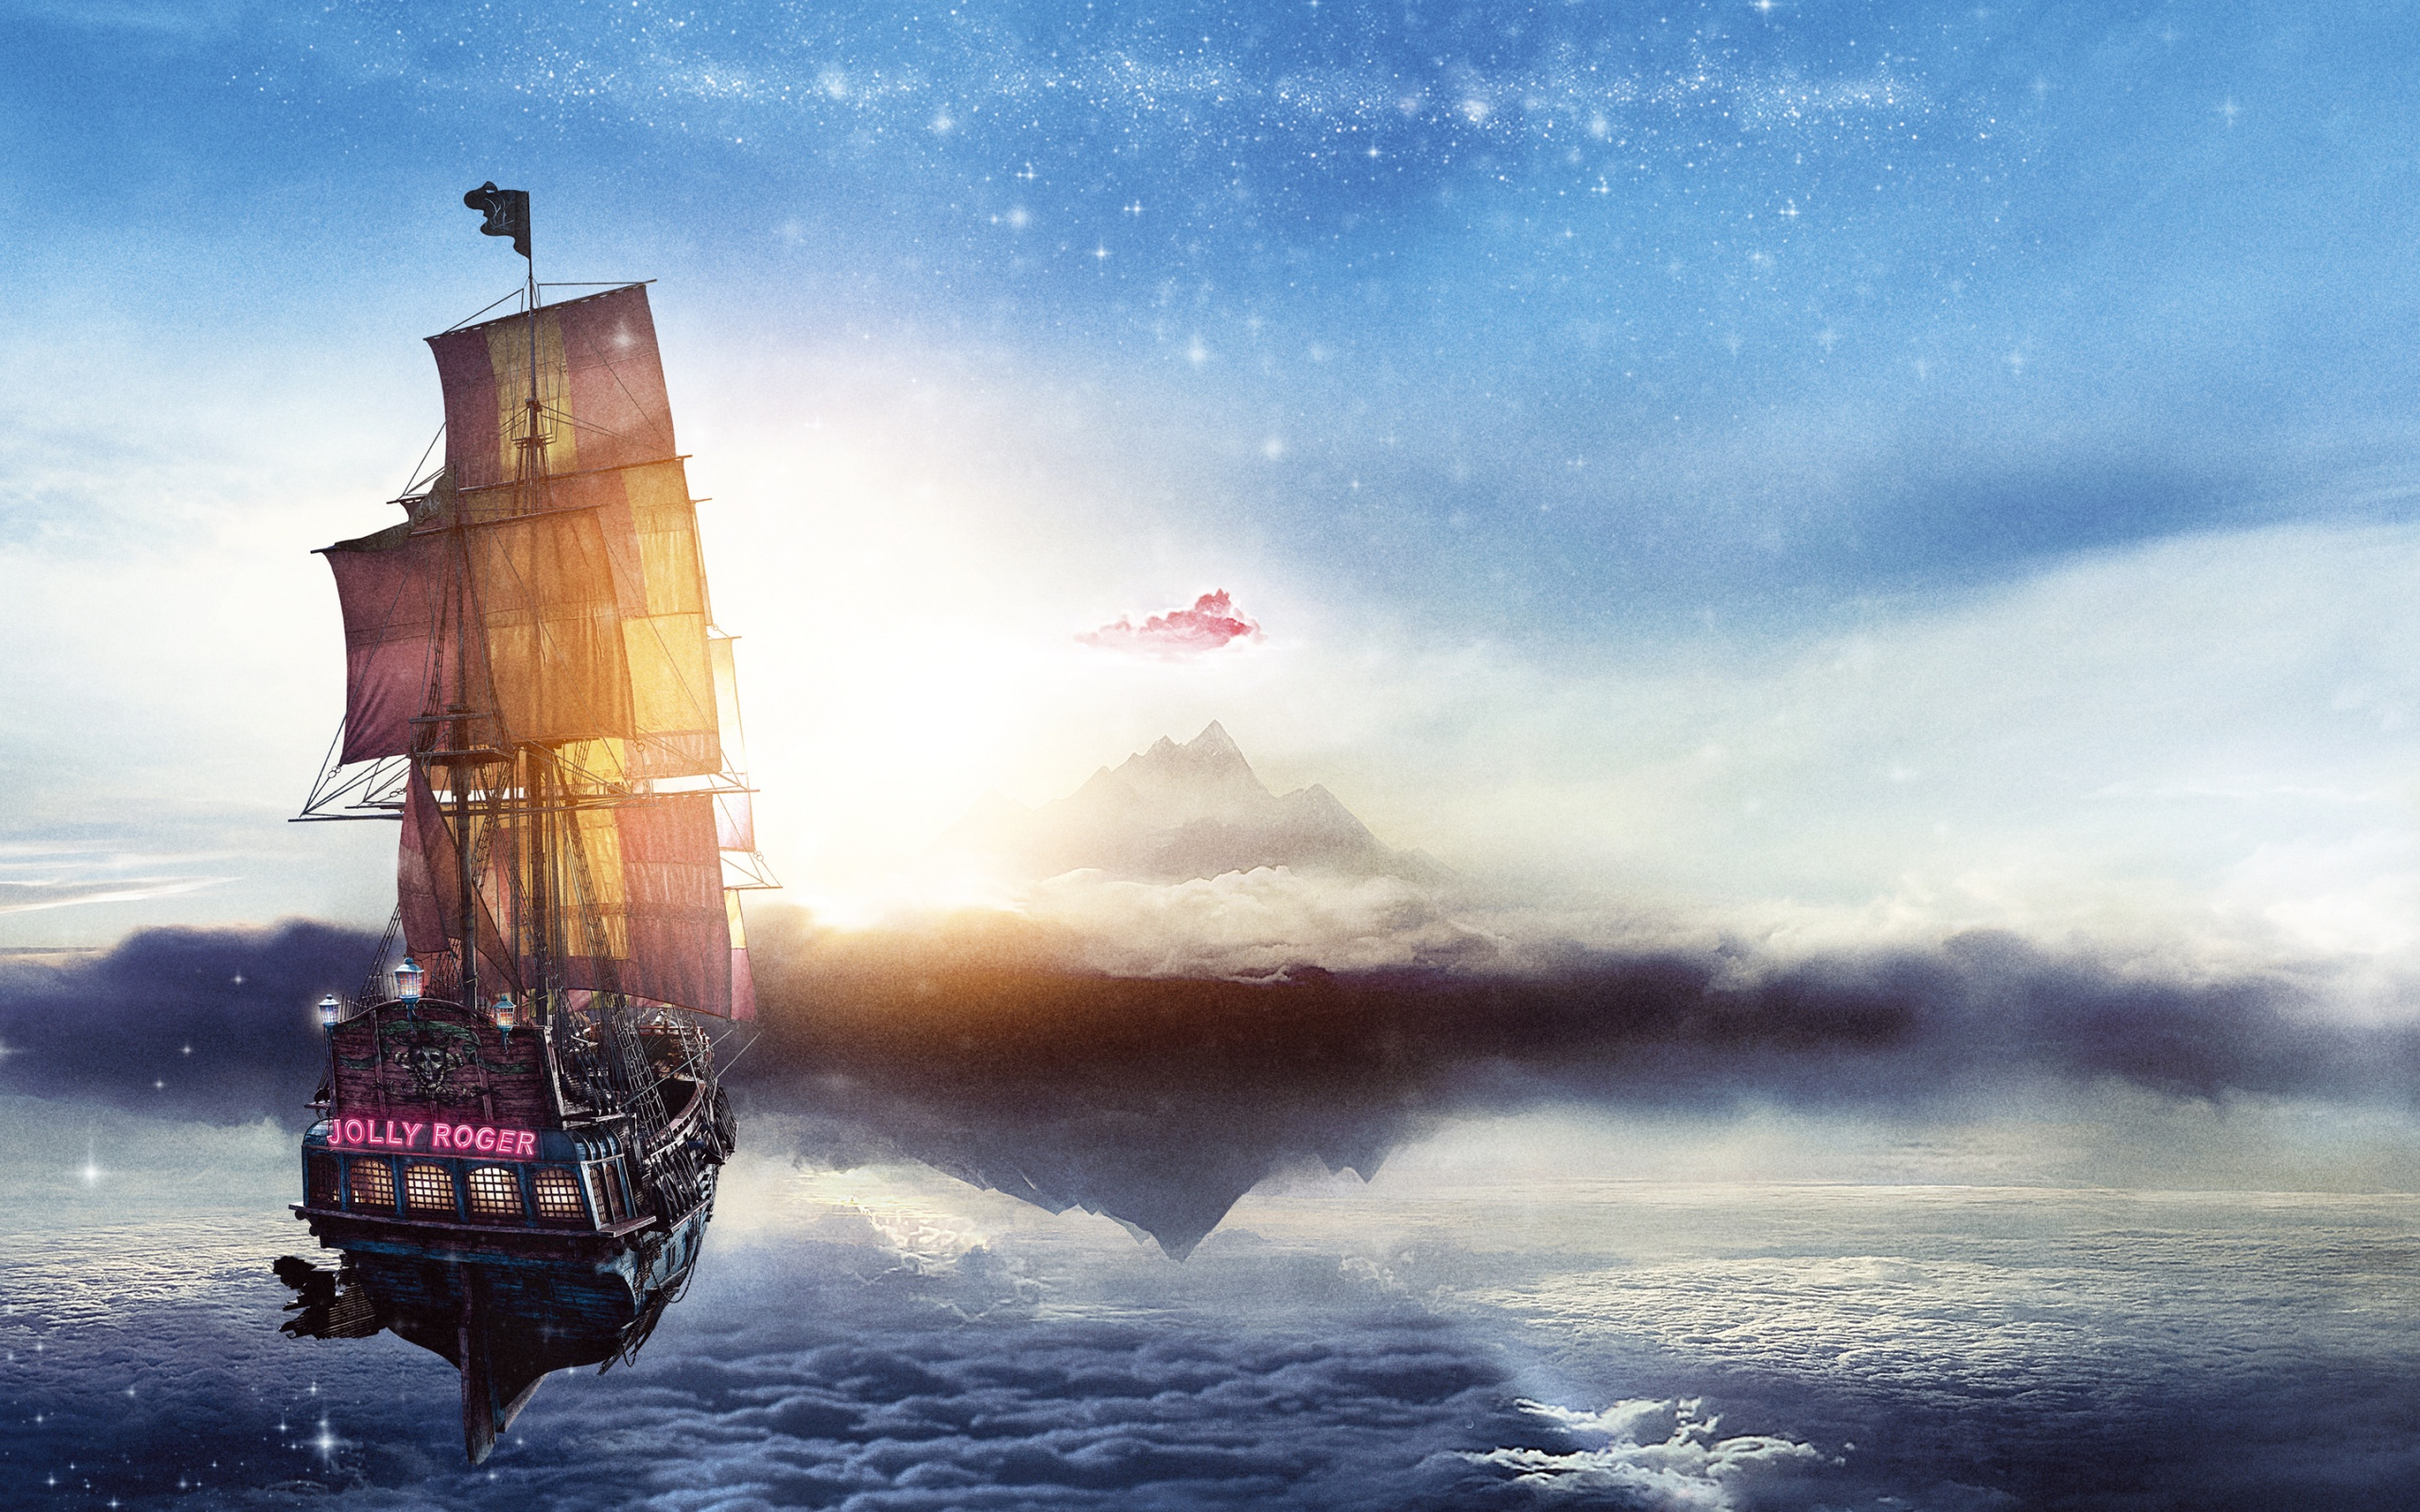 Jolly Roger Pan Pirate Ship Wallpapers